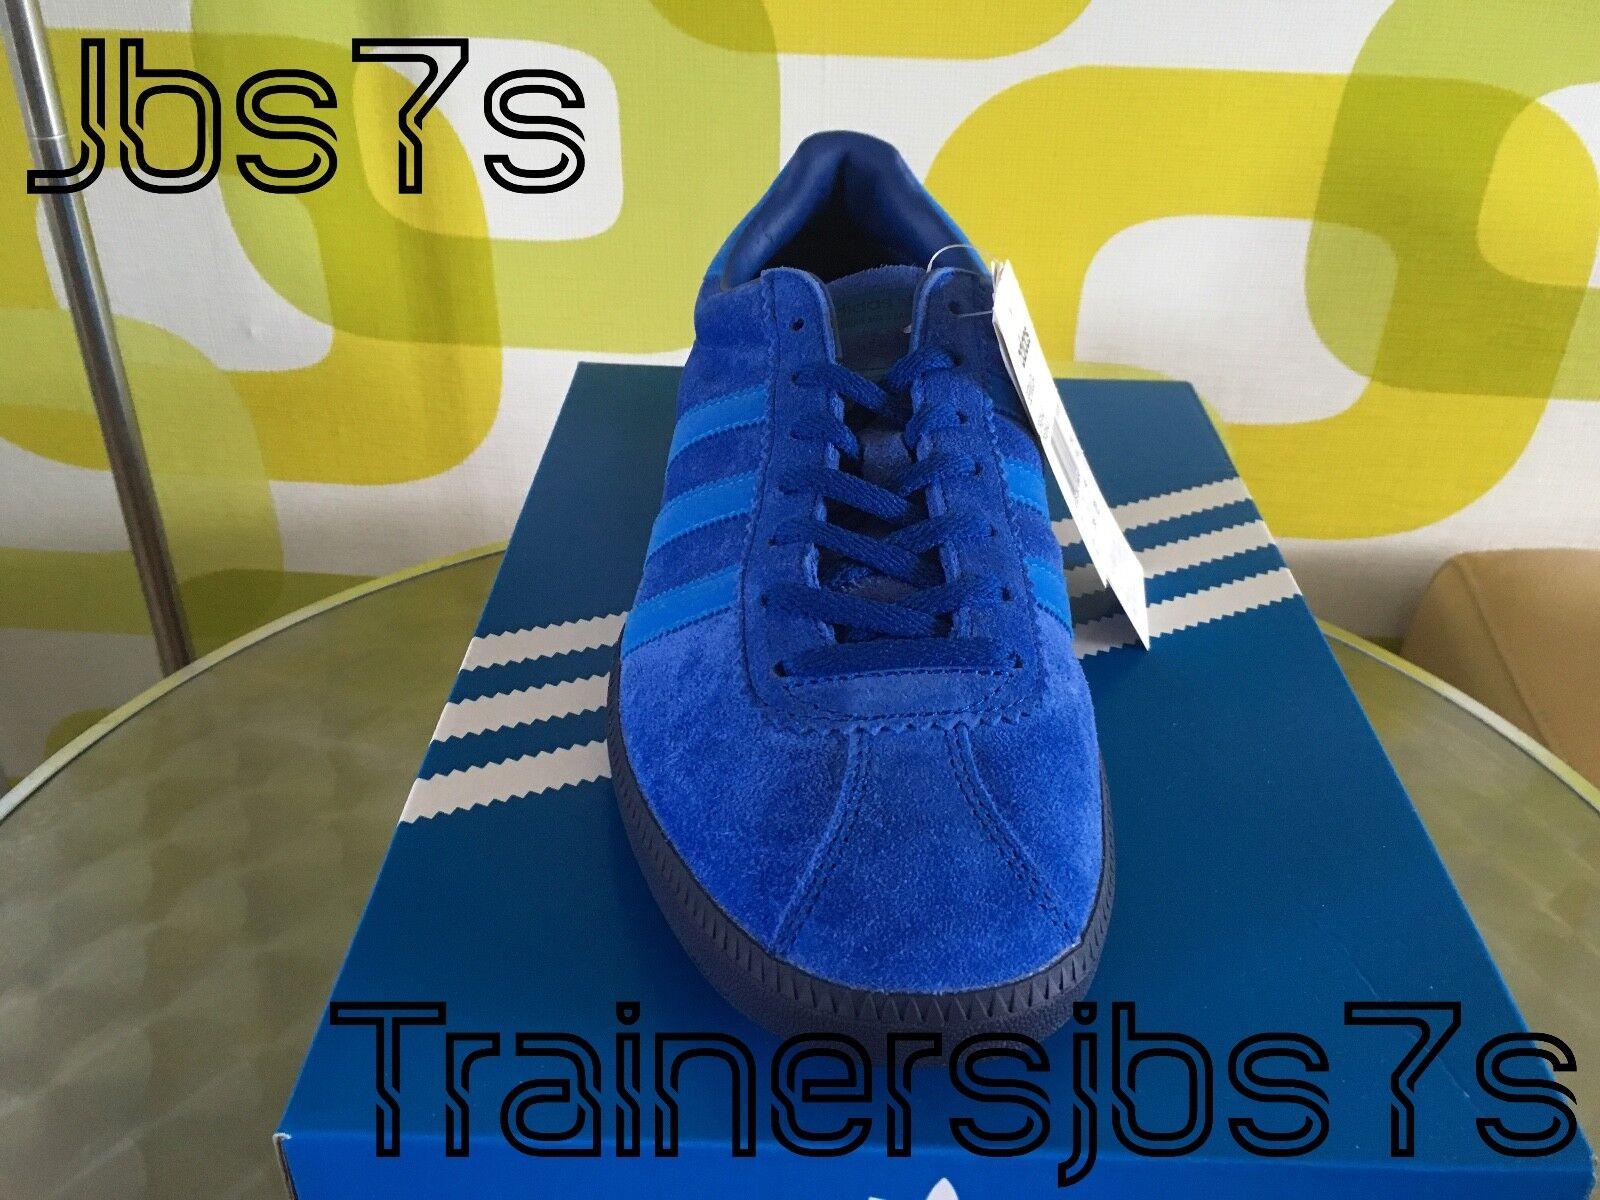 ADIDAS BERMUDA UK11 BNIBWT BNIBWT UK11 2016 Azul Suede spzl casuales Vintage 80s a230f8